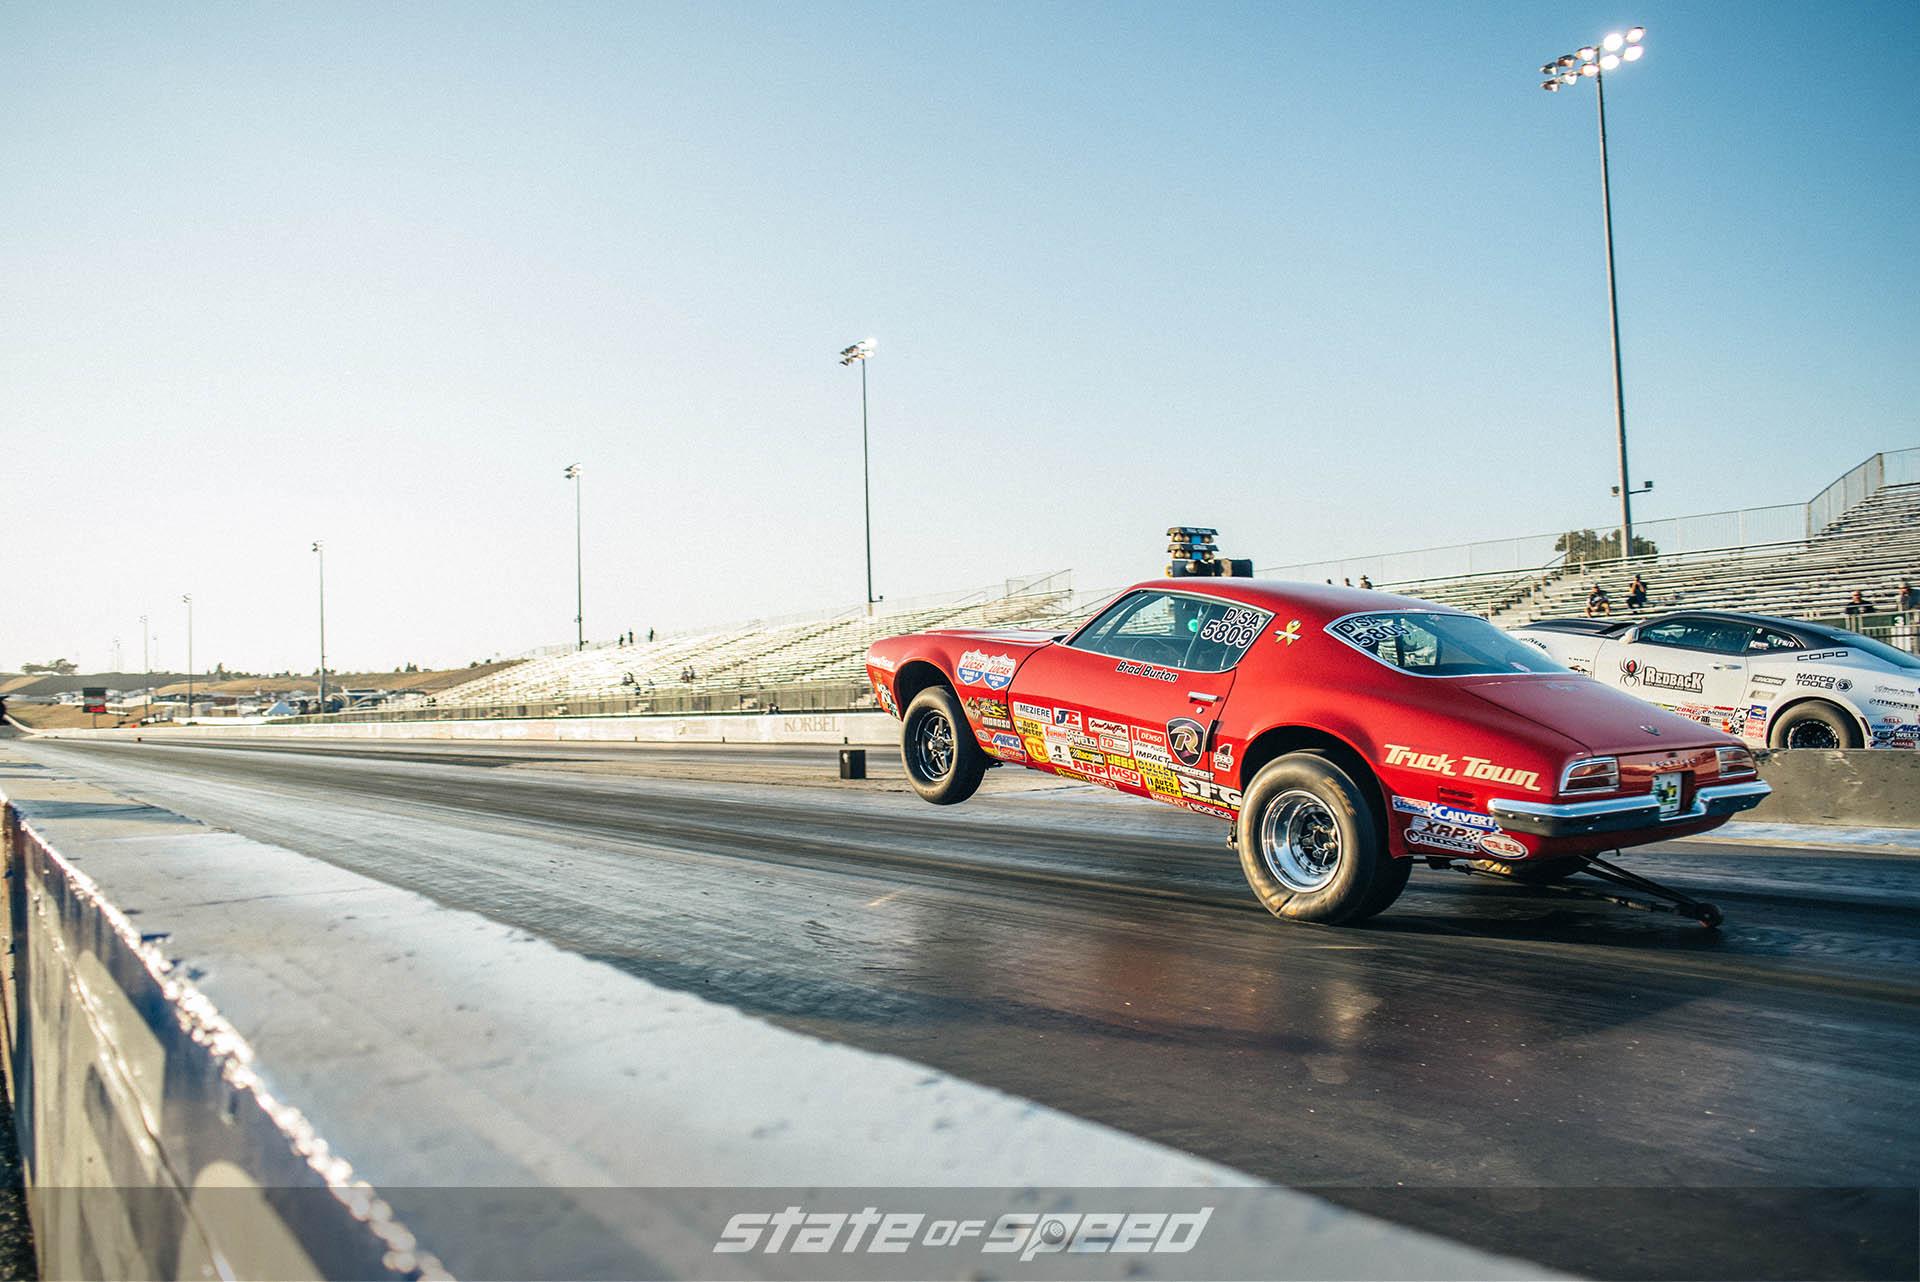 Racing down the dragstrip